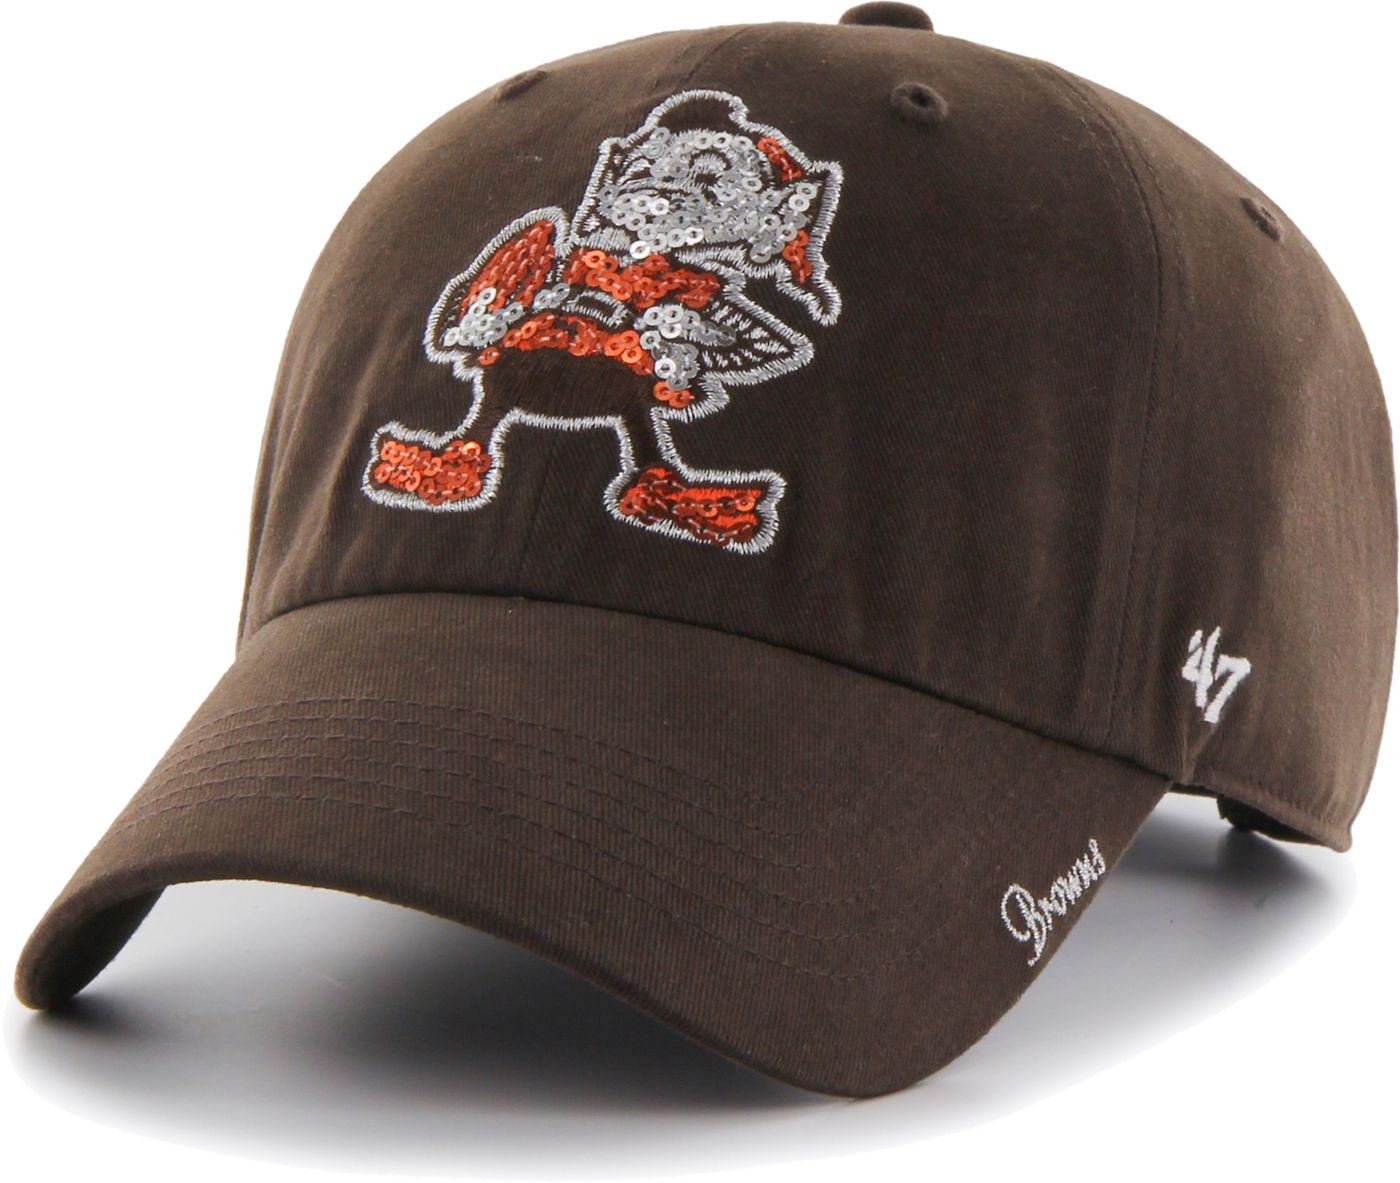 '47 Women's Cleveland Browns Sparkle Legacy Brown Adjustable Hat